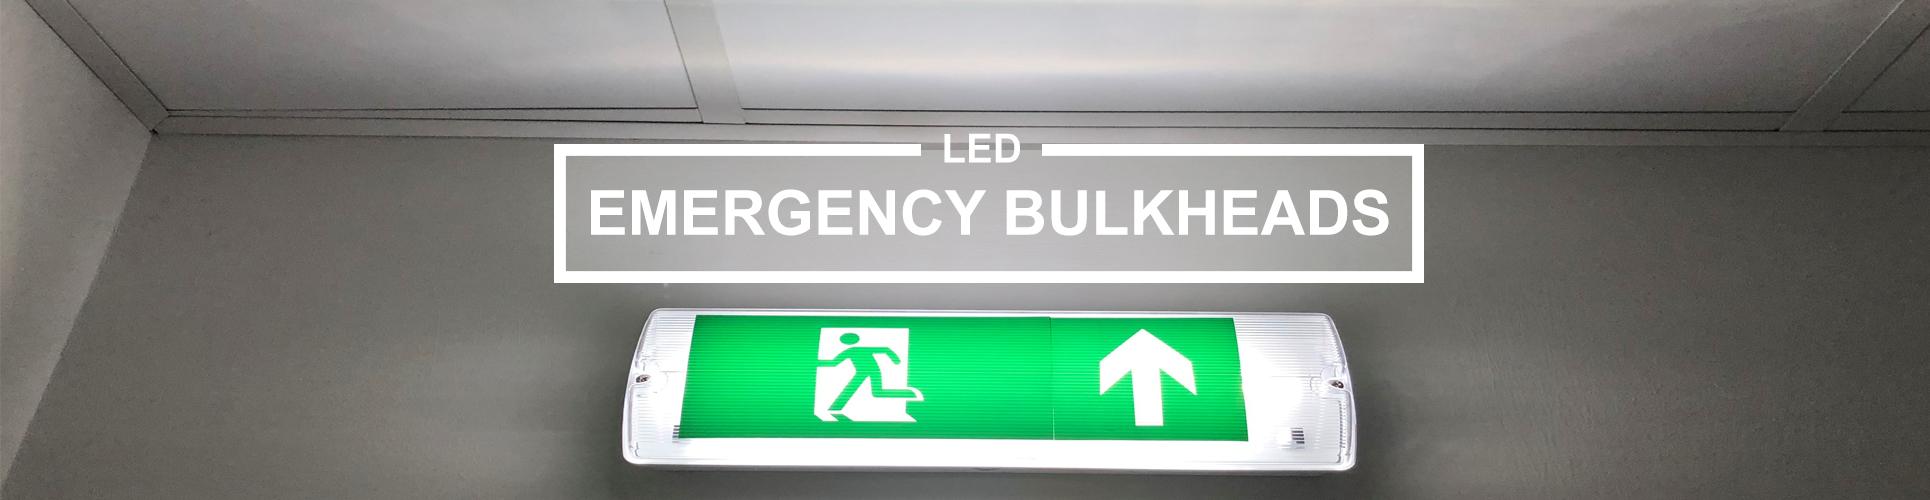 Emergency bulkheads